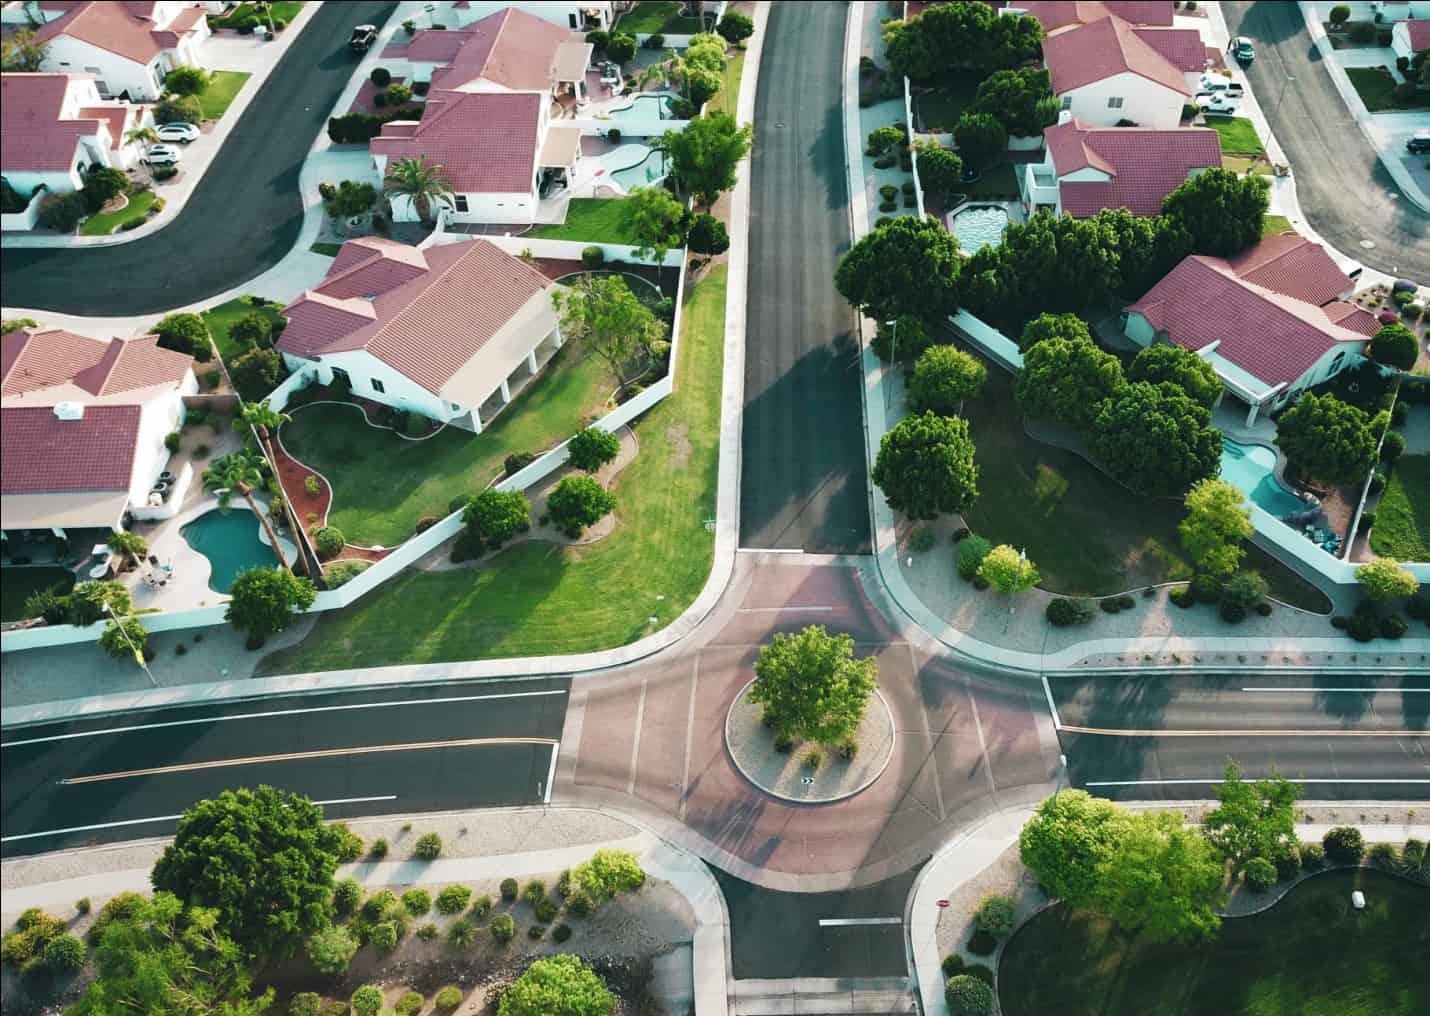 Neighborhood at Daytime